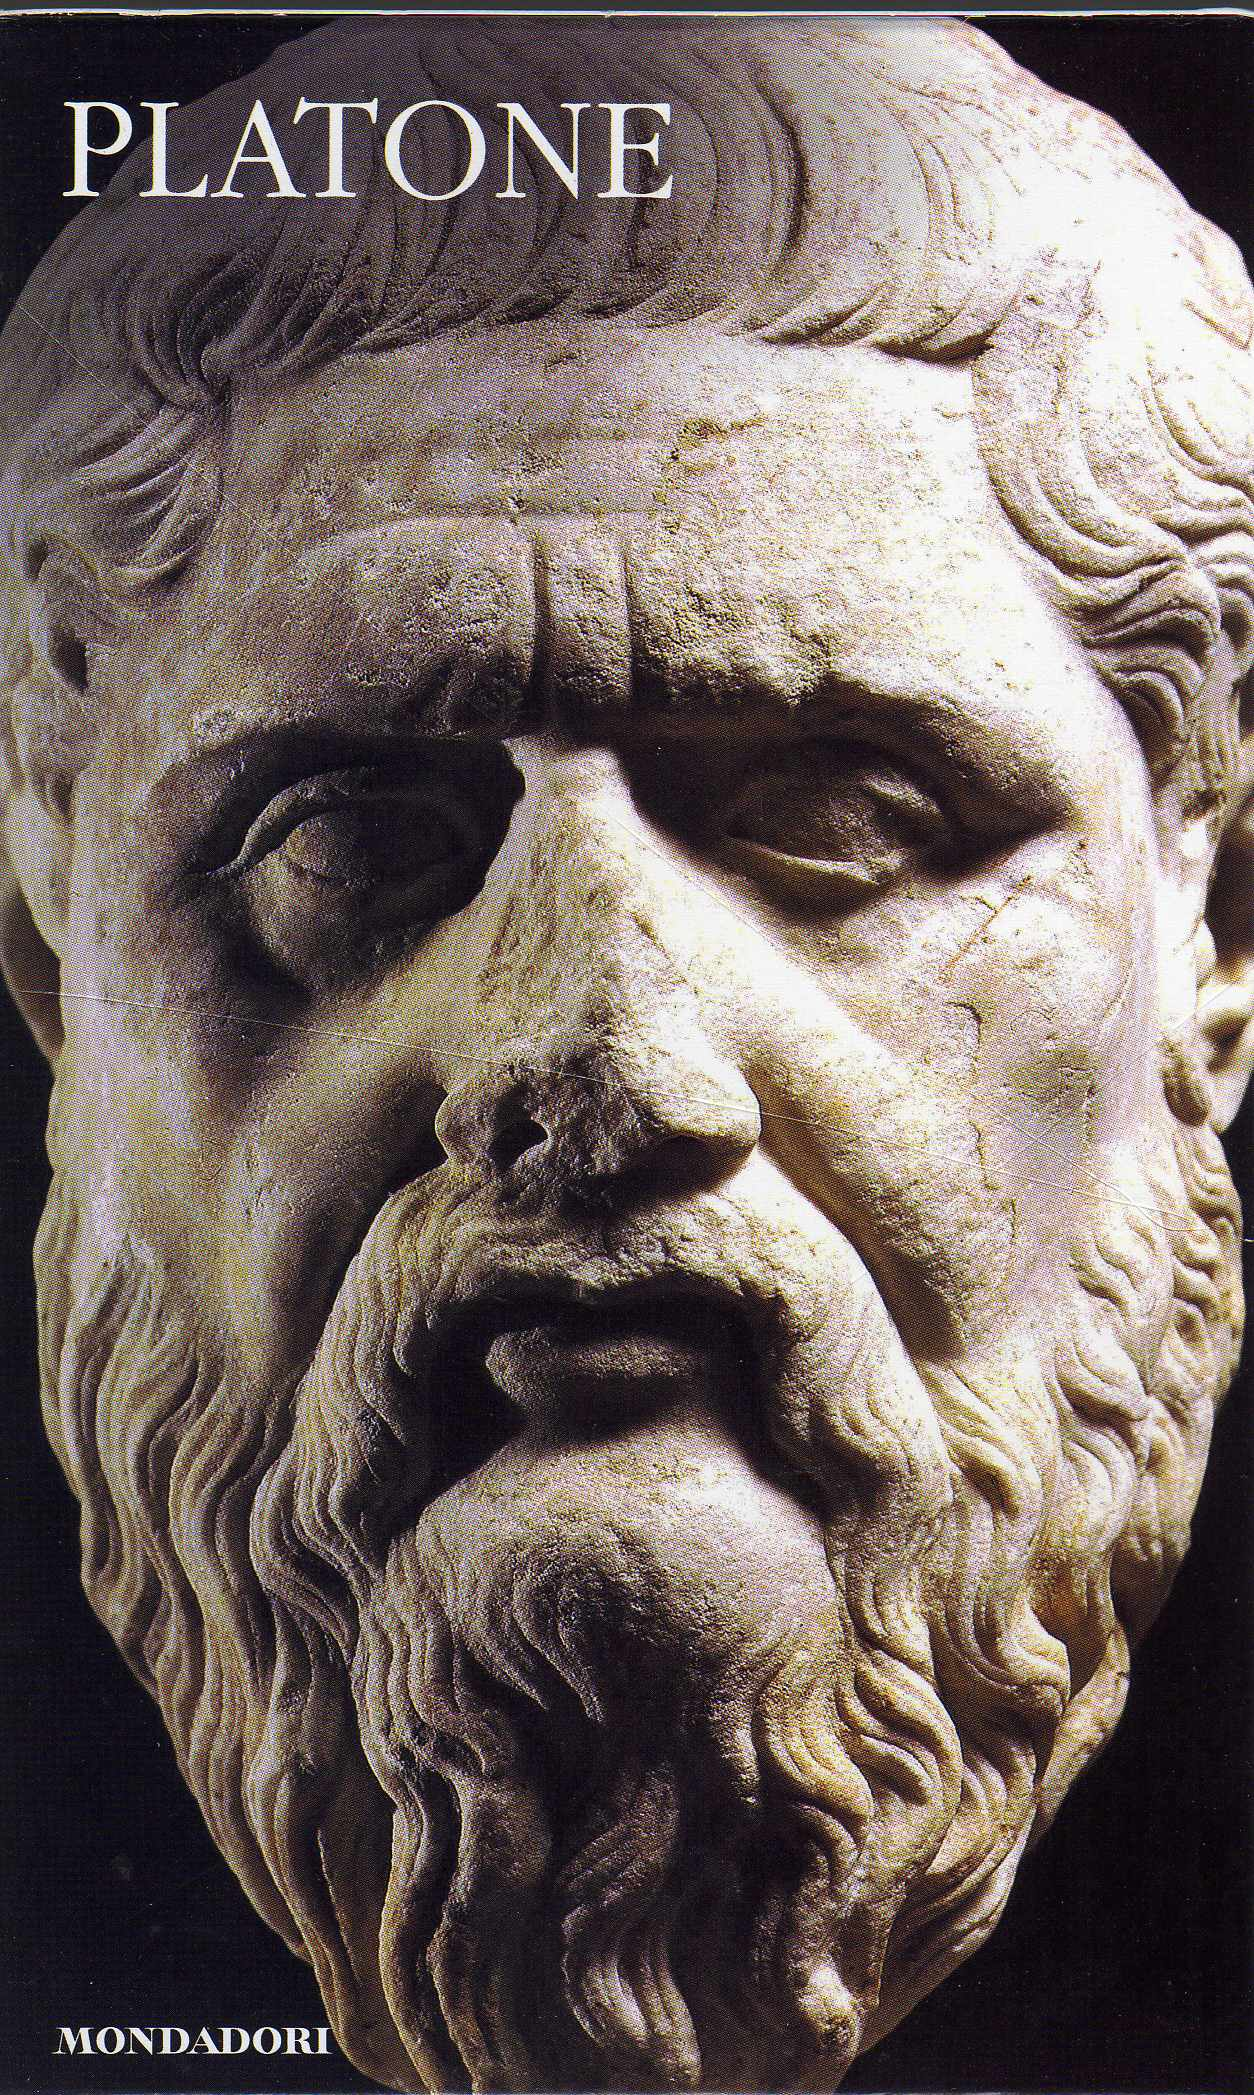 Platone (volume secondo)